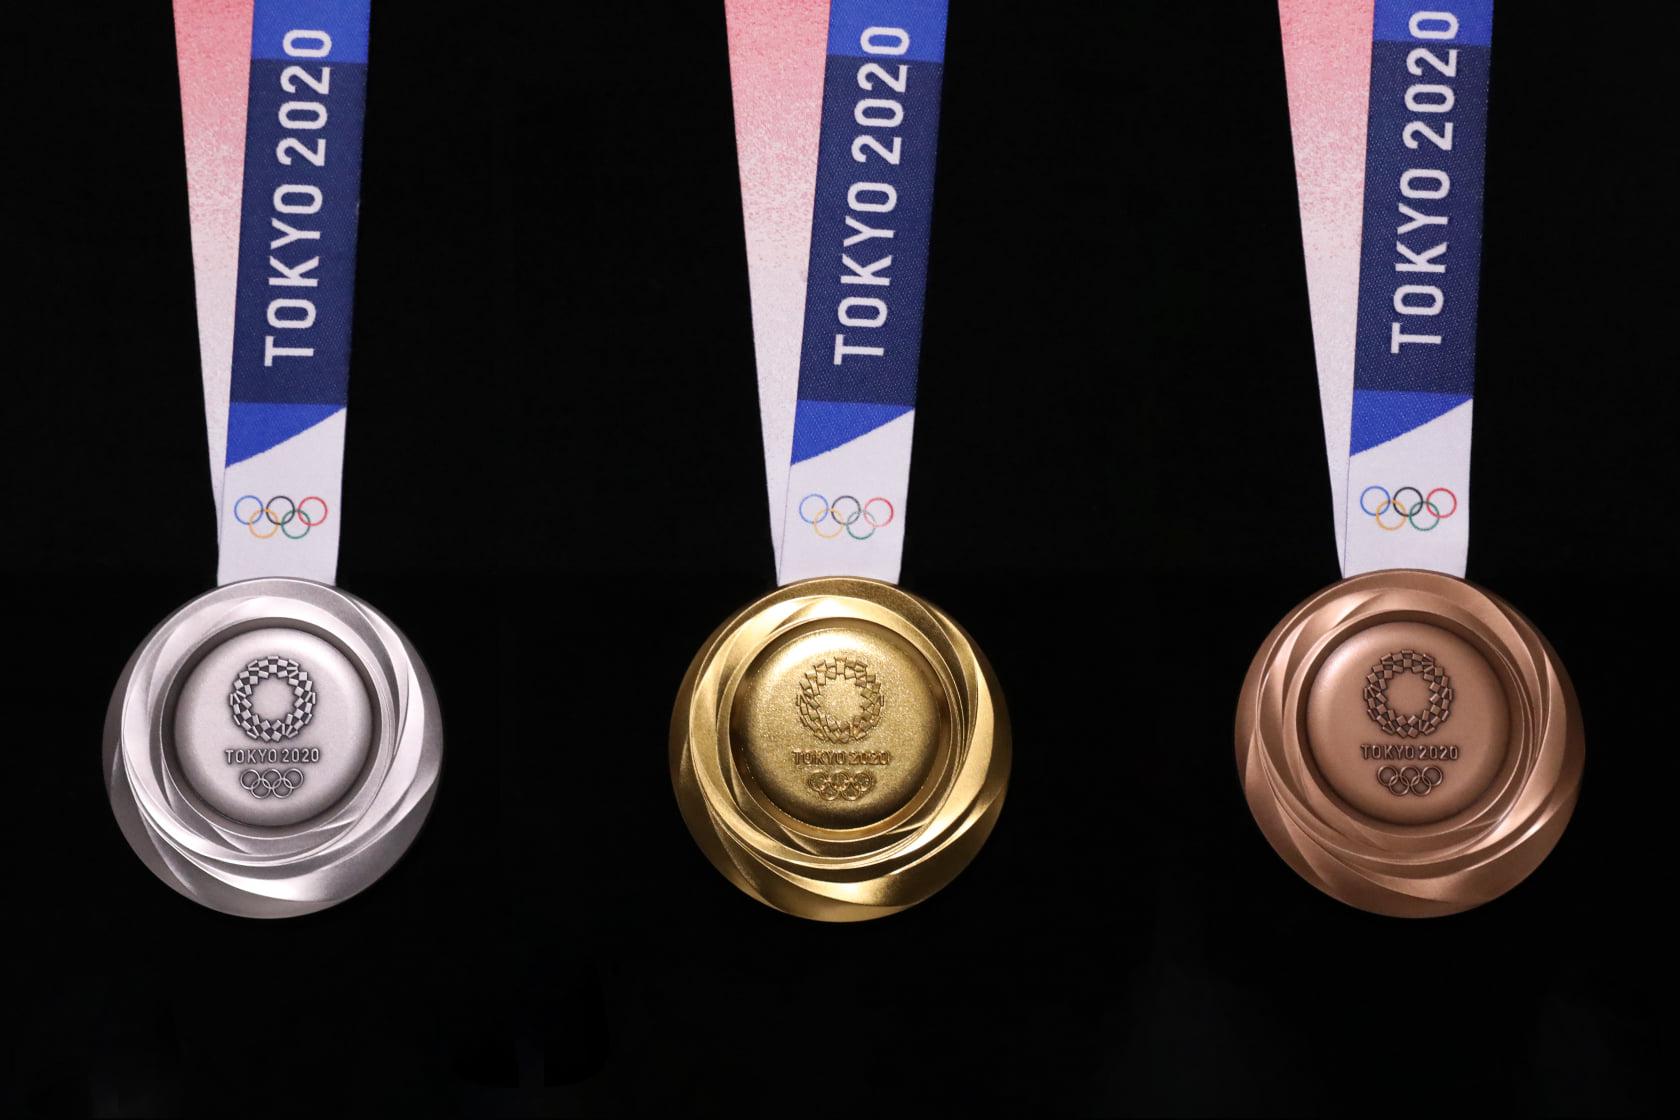 tokio olimpiada medale  - Polski Komitet Olimpijski